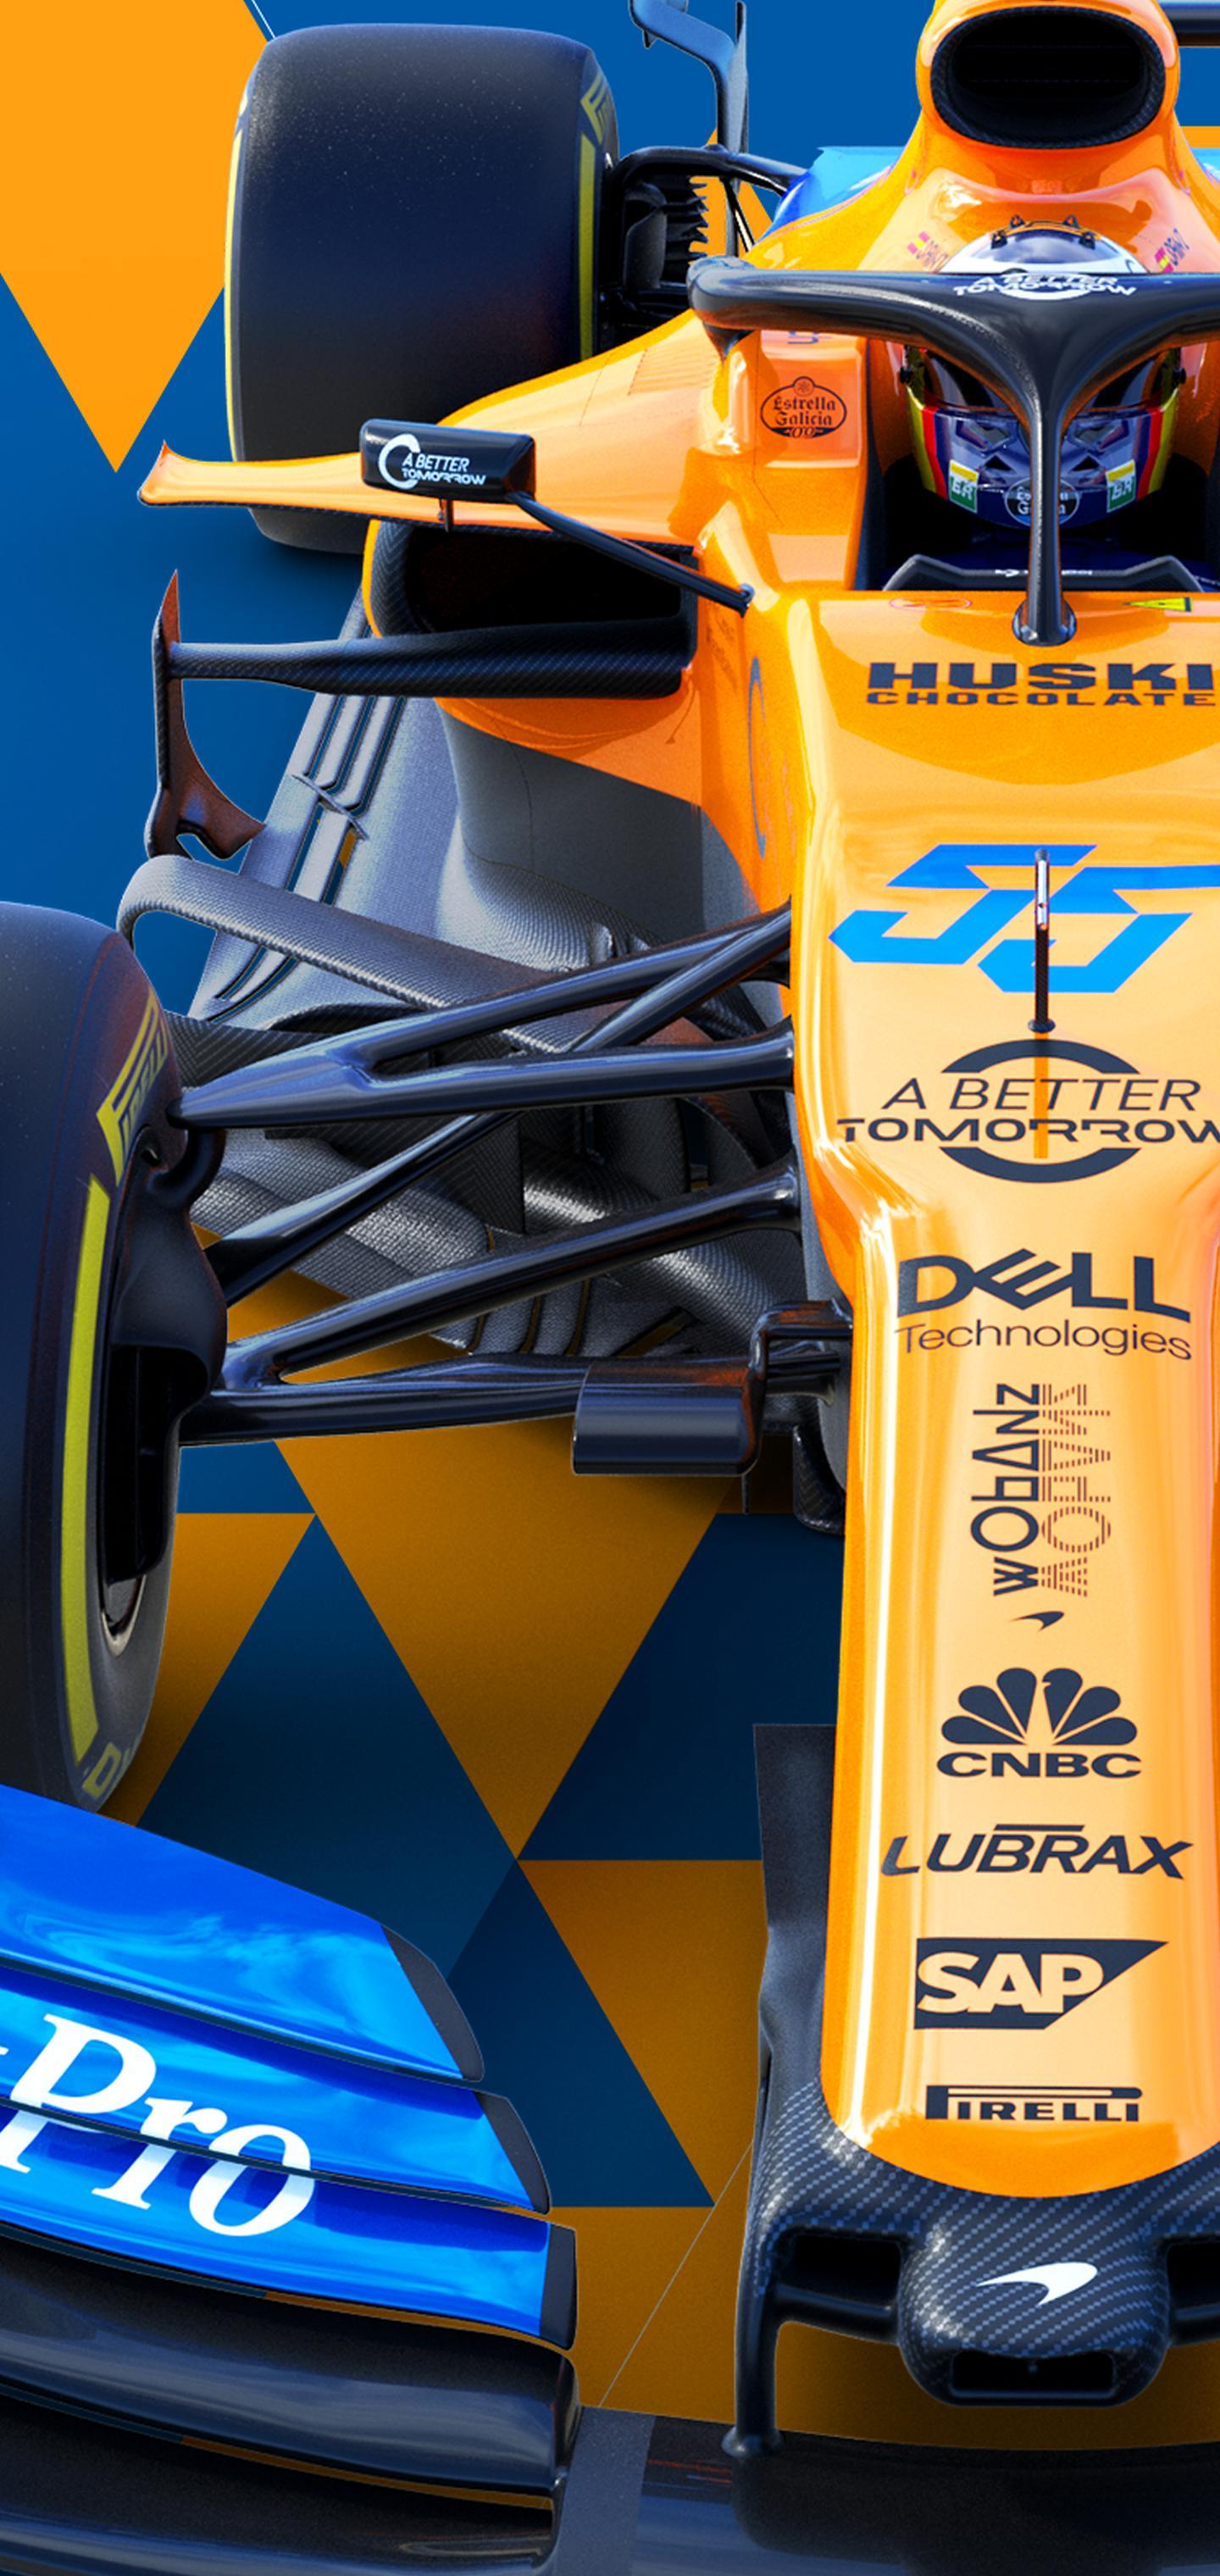 Mclaren F1 Racing 2 by Aymms16 Galaxy S10 Hole Punch Wallpaper 1440x3040